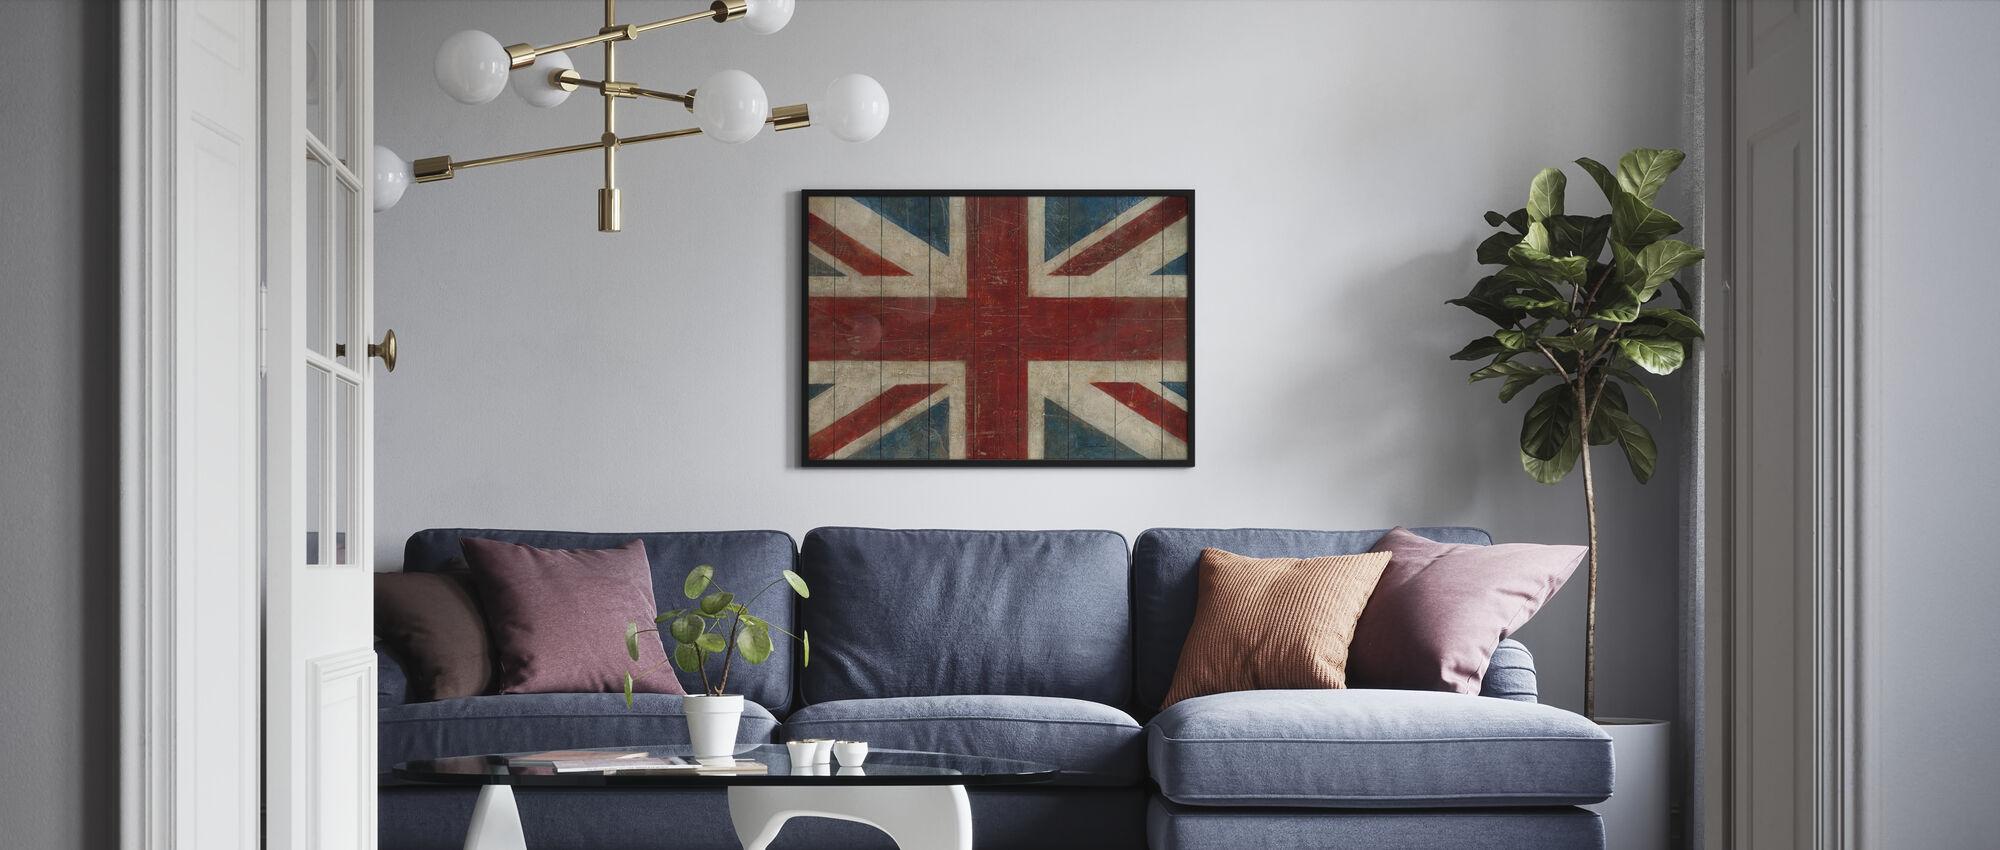 Avery Tillmon - Union Jack - Poster - Woonkamer